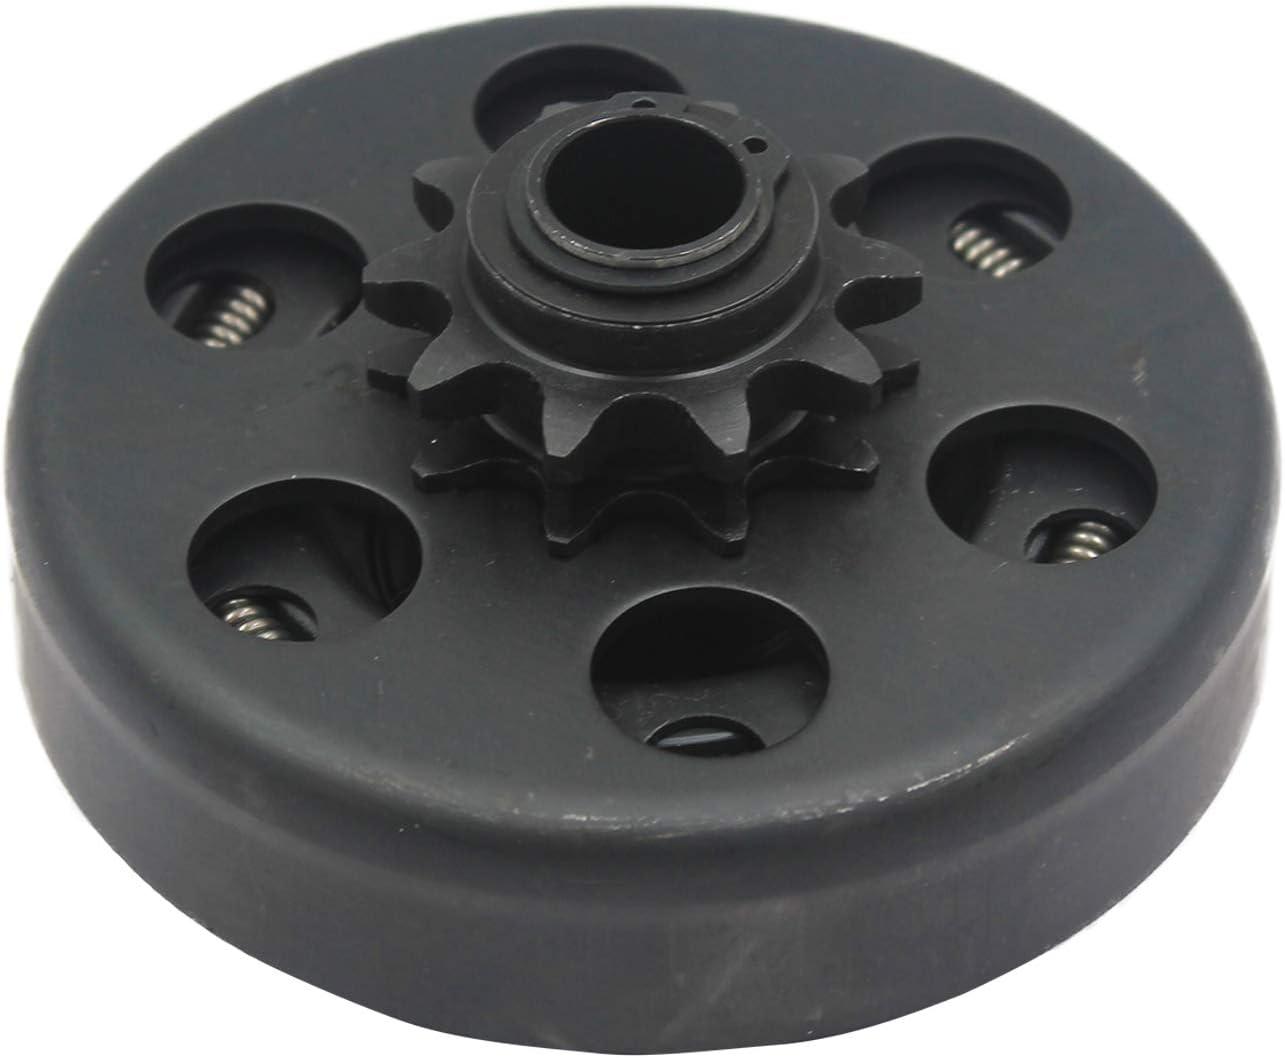 LAFORMO Go kart//Mini Bike Centrifugal Clutch 5//8 Bore 10 Tooth for 40 41 420 Chain 6.5HP